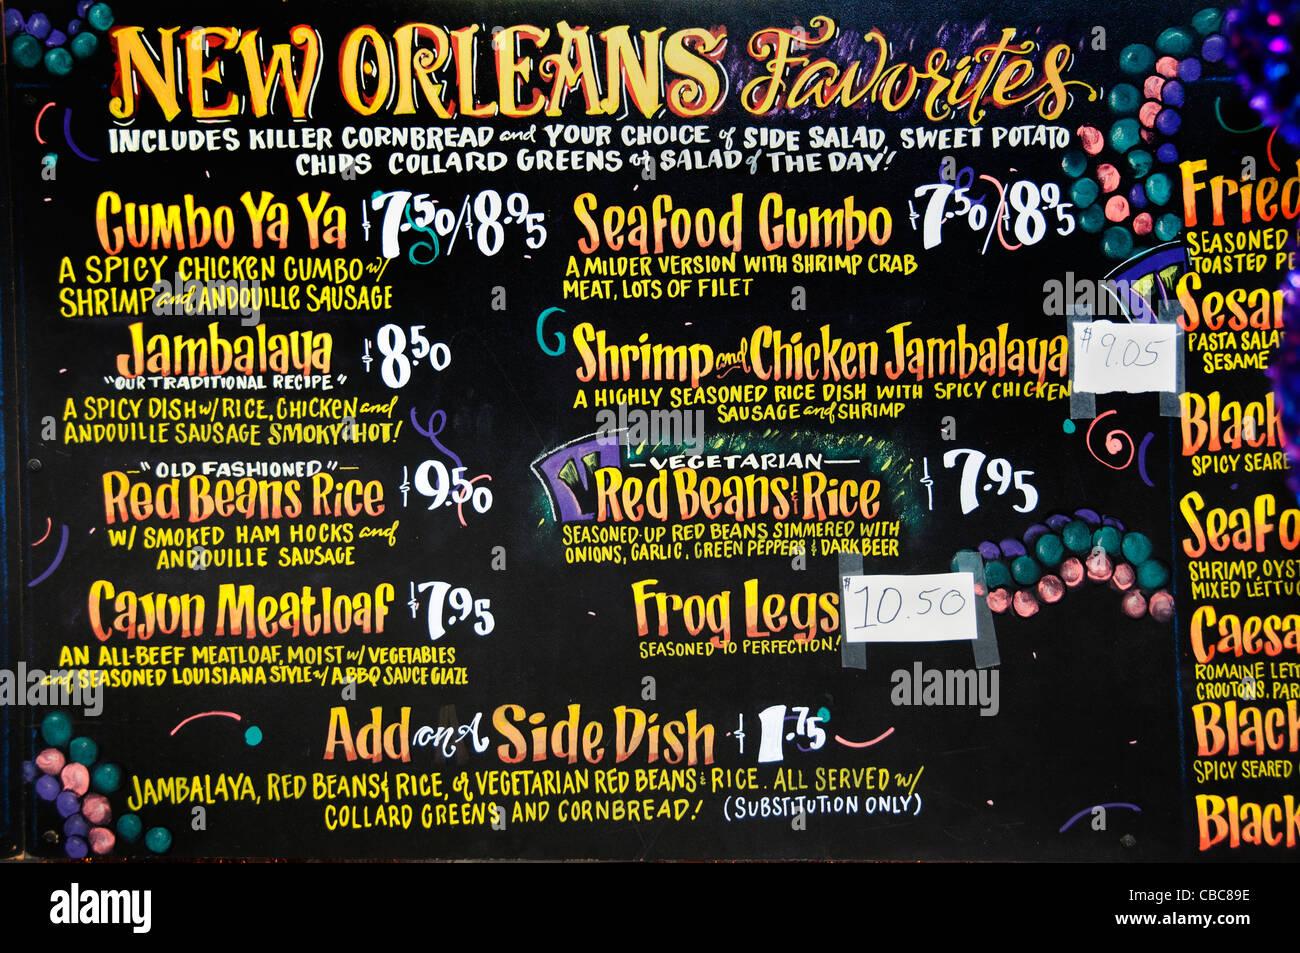 New Orleans Menu Southern Style Restaurant Cajun Shrimp Chicken Jambalaya Seafood Gumbo United States - Stock Image